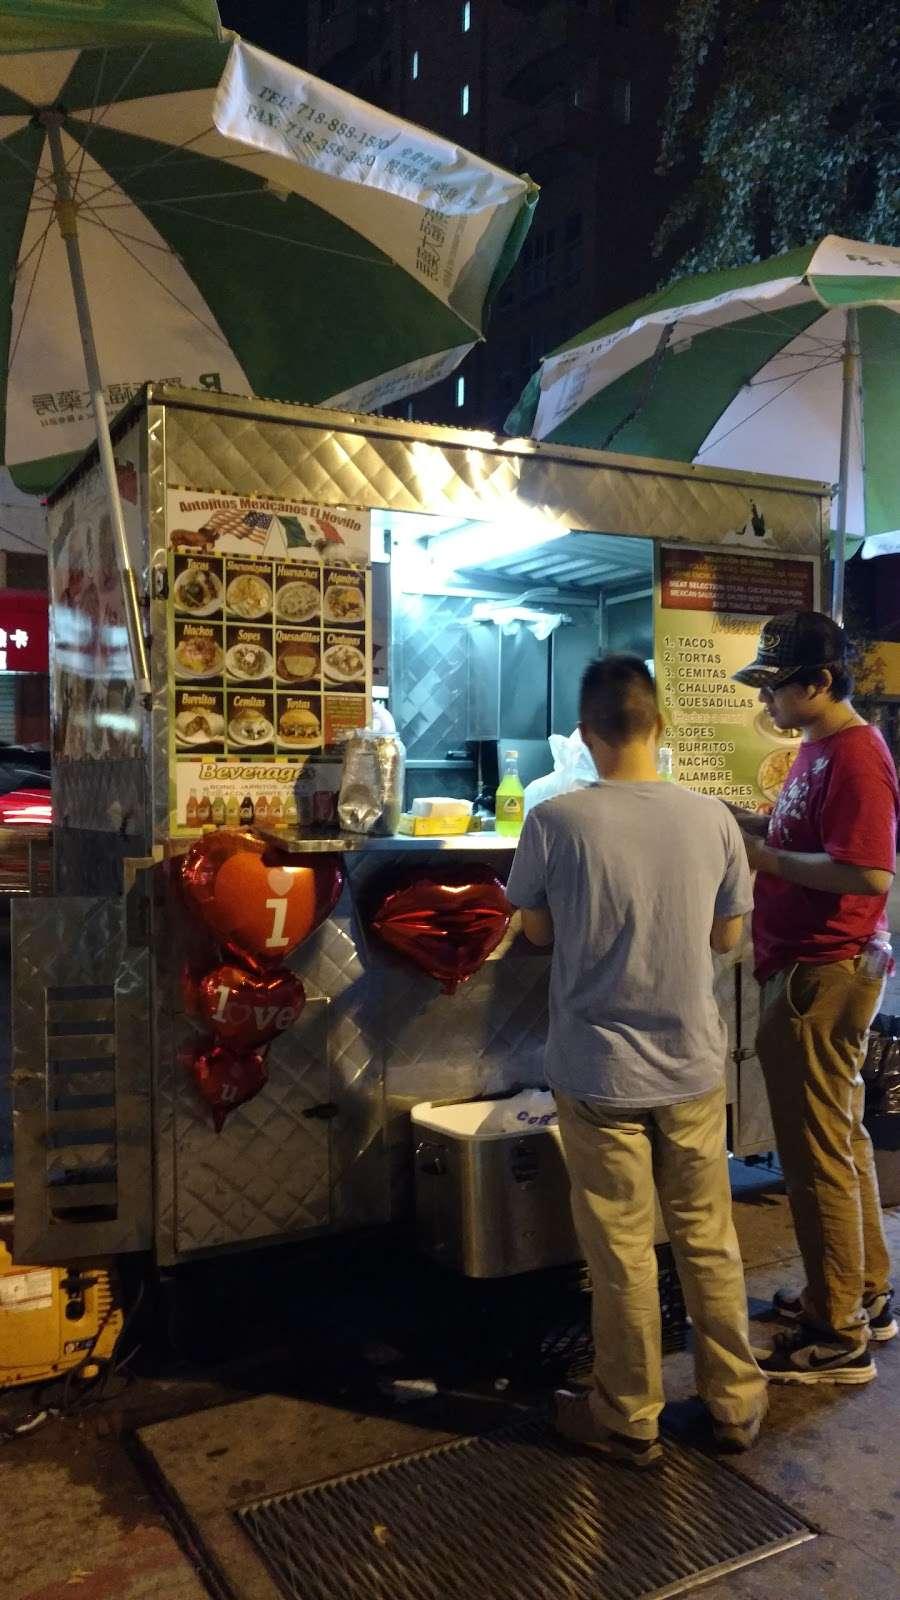 El Novillo - Antojitos Mexicanos - restaurant  | Photo 2 of 8 | Address: 40-0 Prince St, Flushing, NY 11354, USA